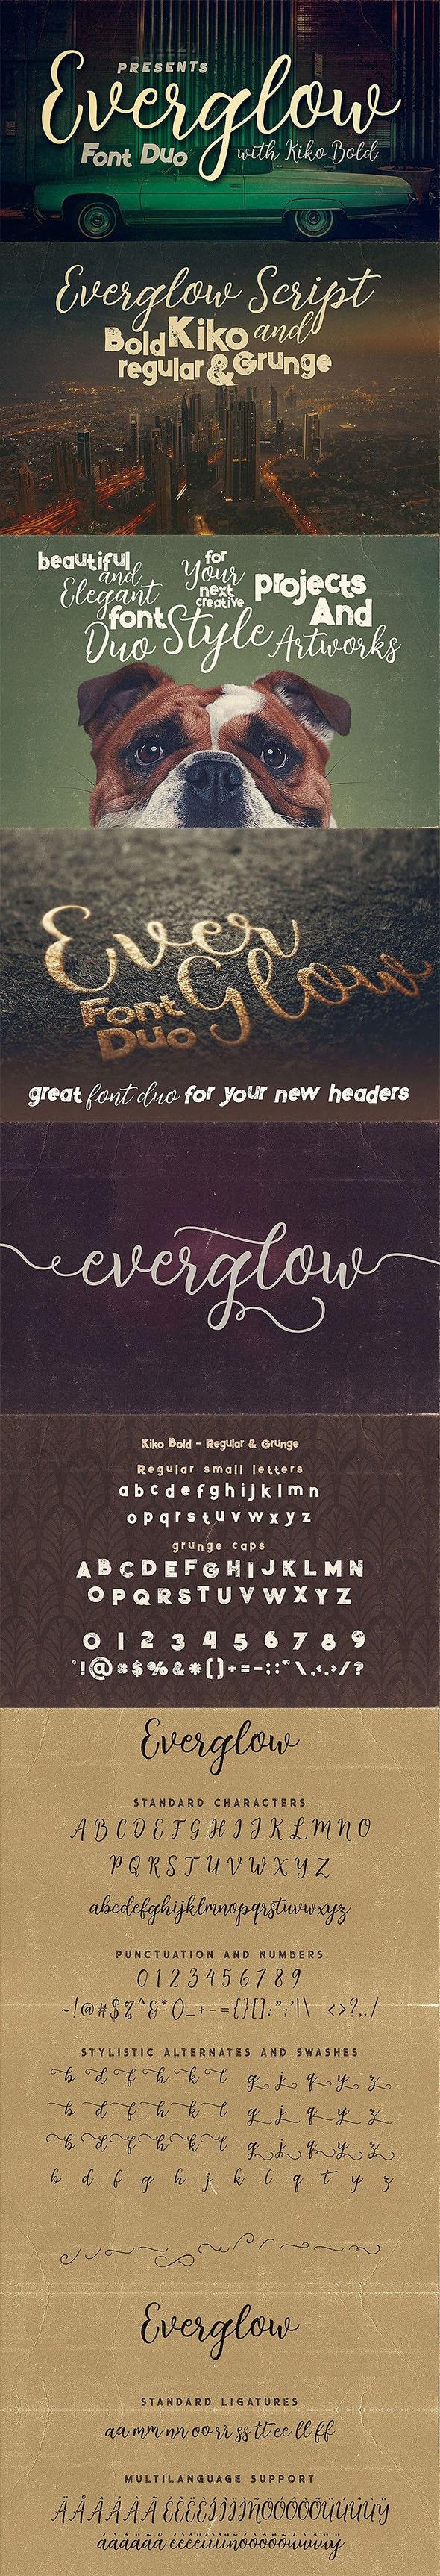 Everglow Script Font Duo - Hand-writing Script